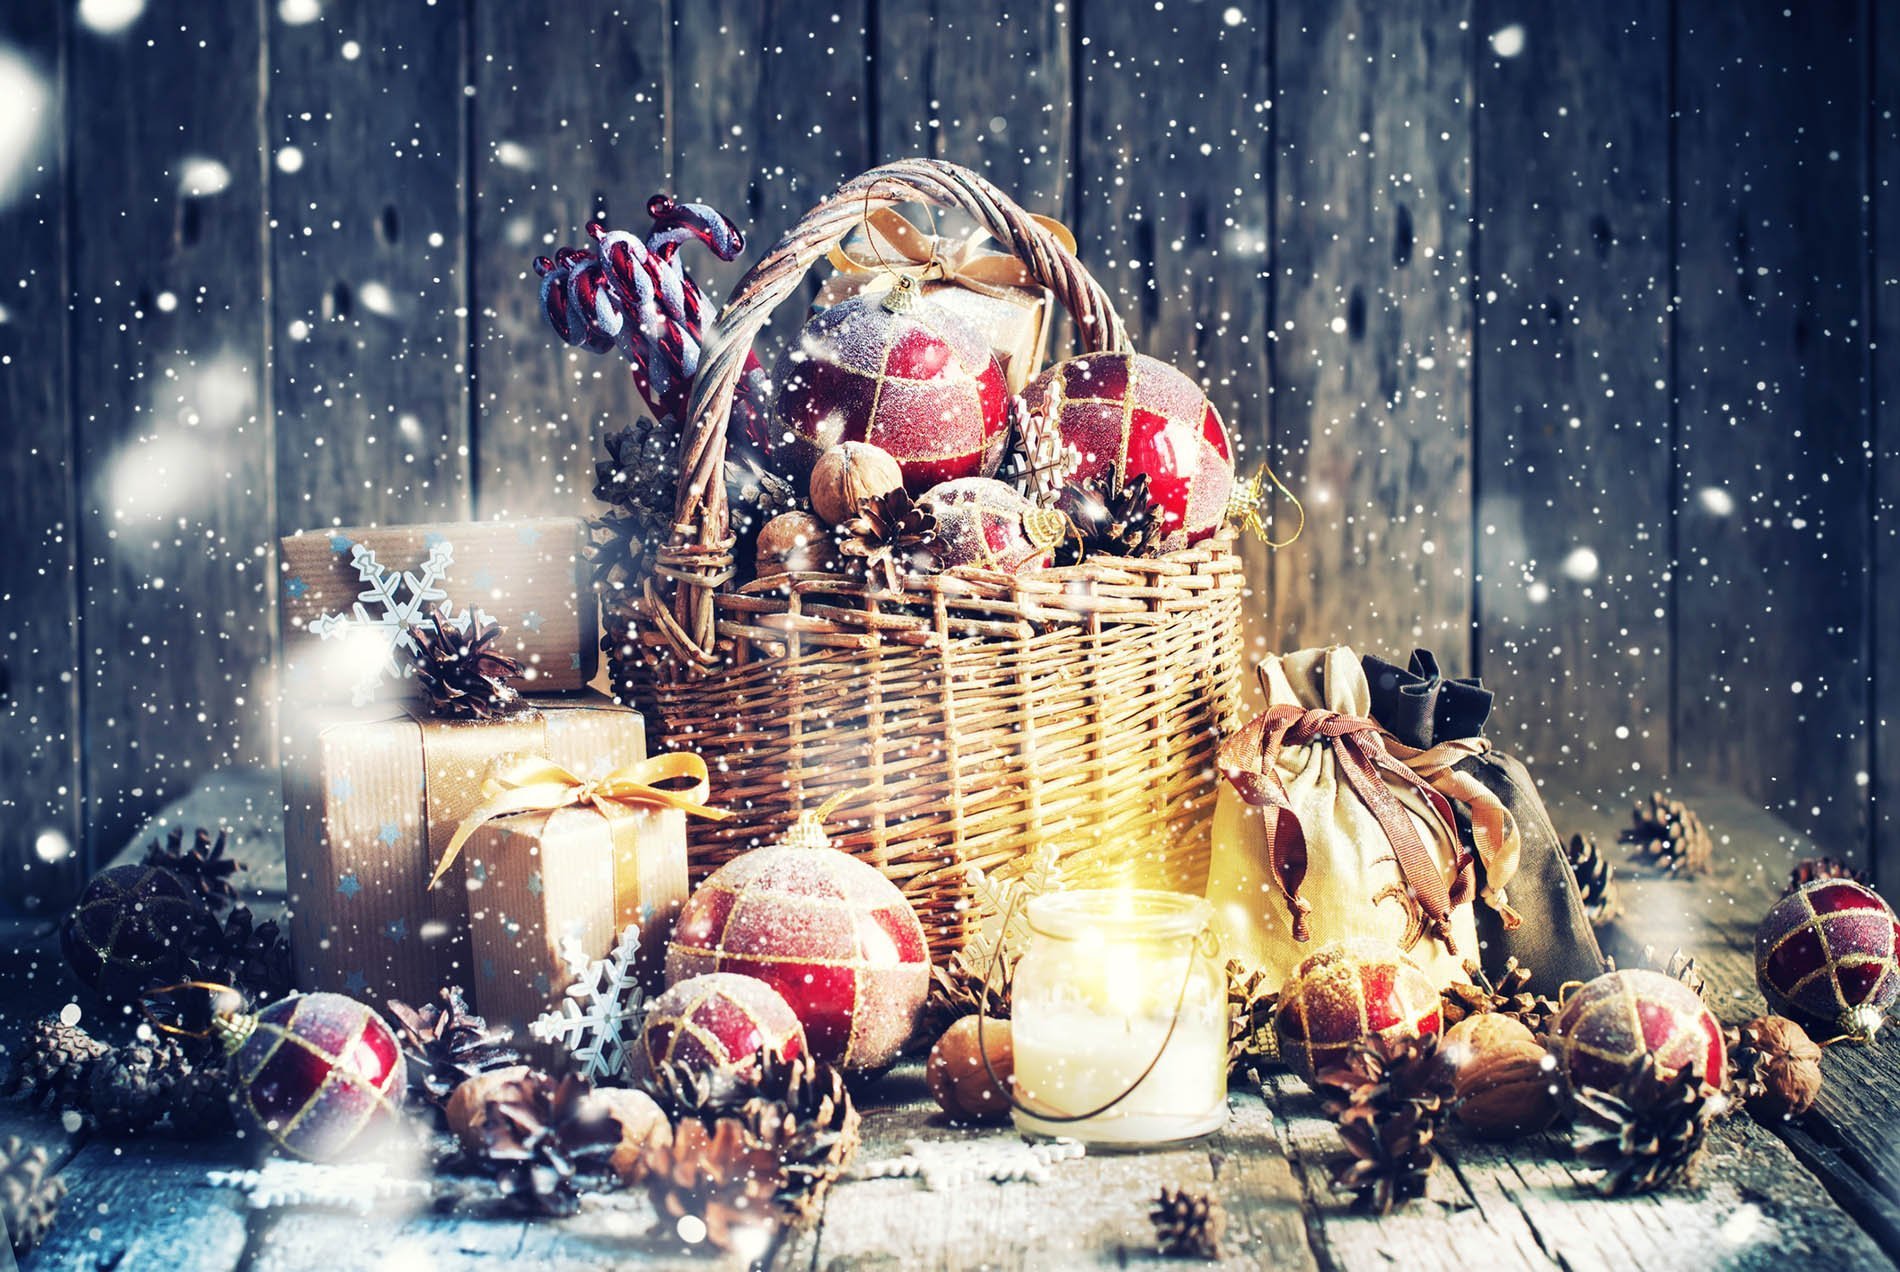 Cesti natalizi